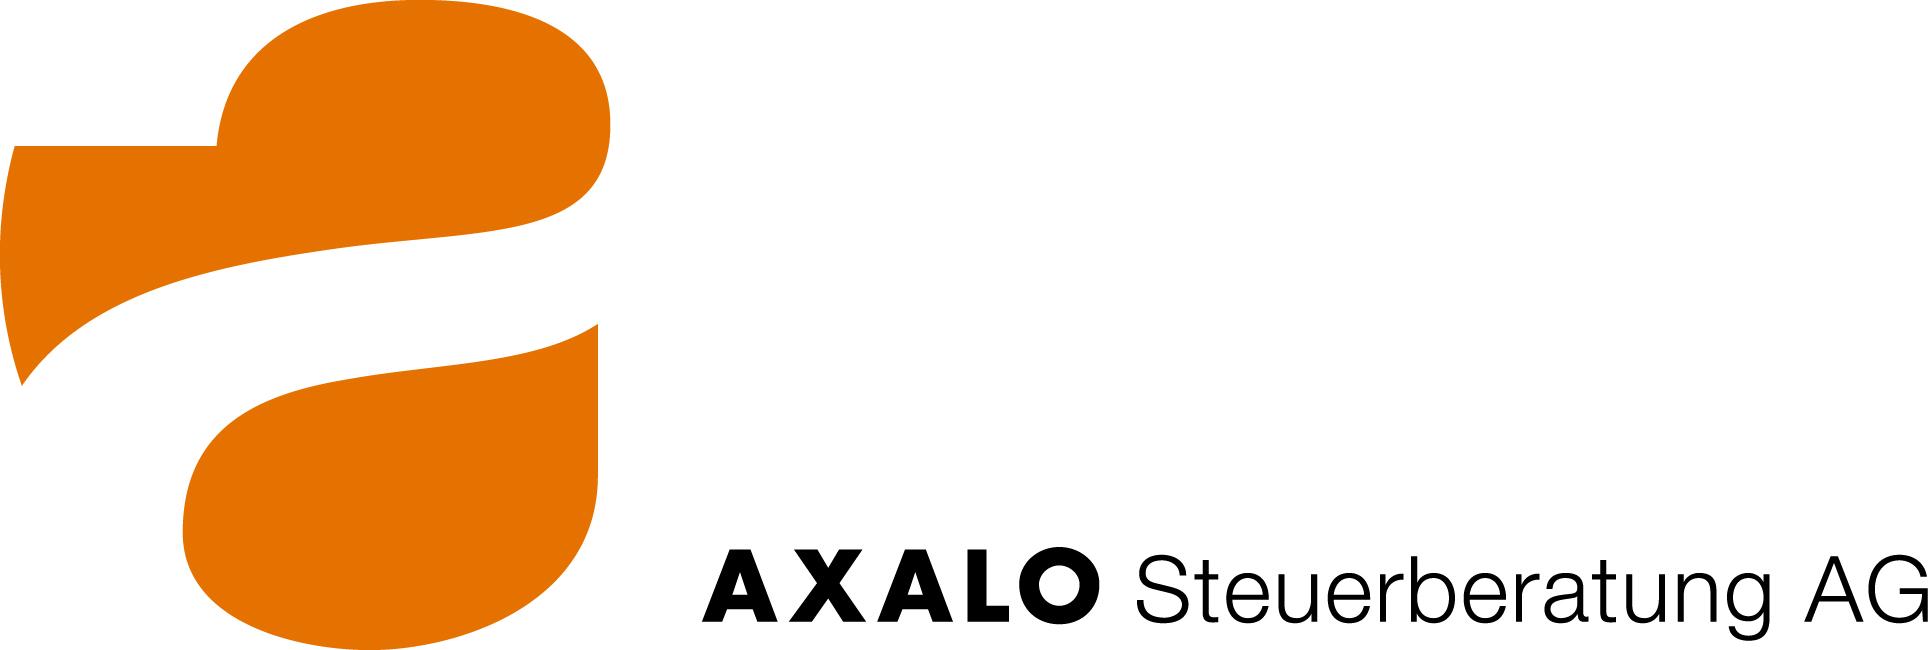 Images Axalo Steuerberatung AG